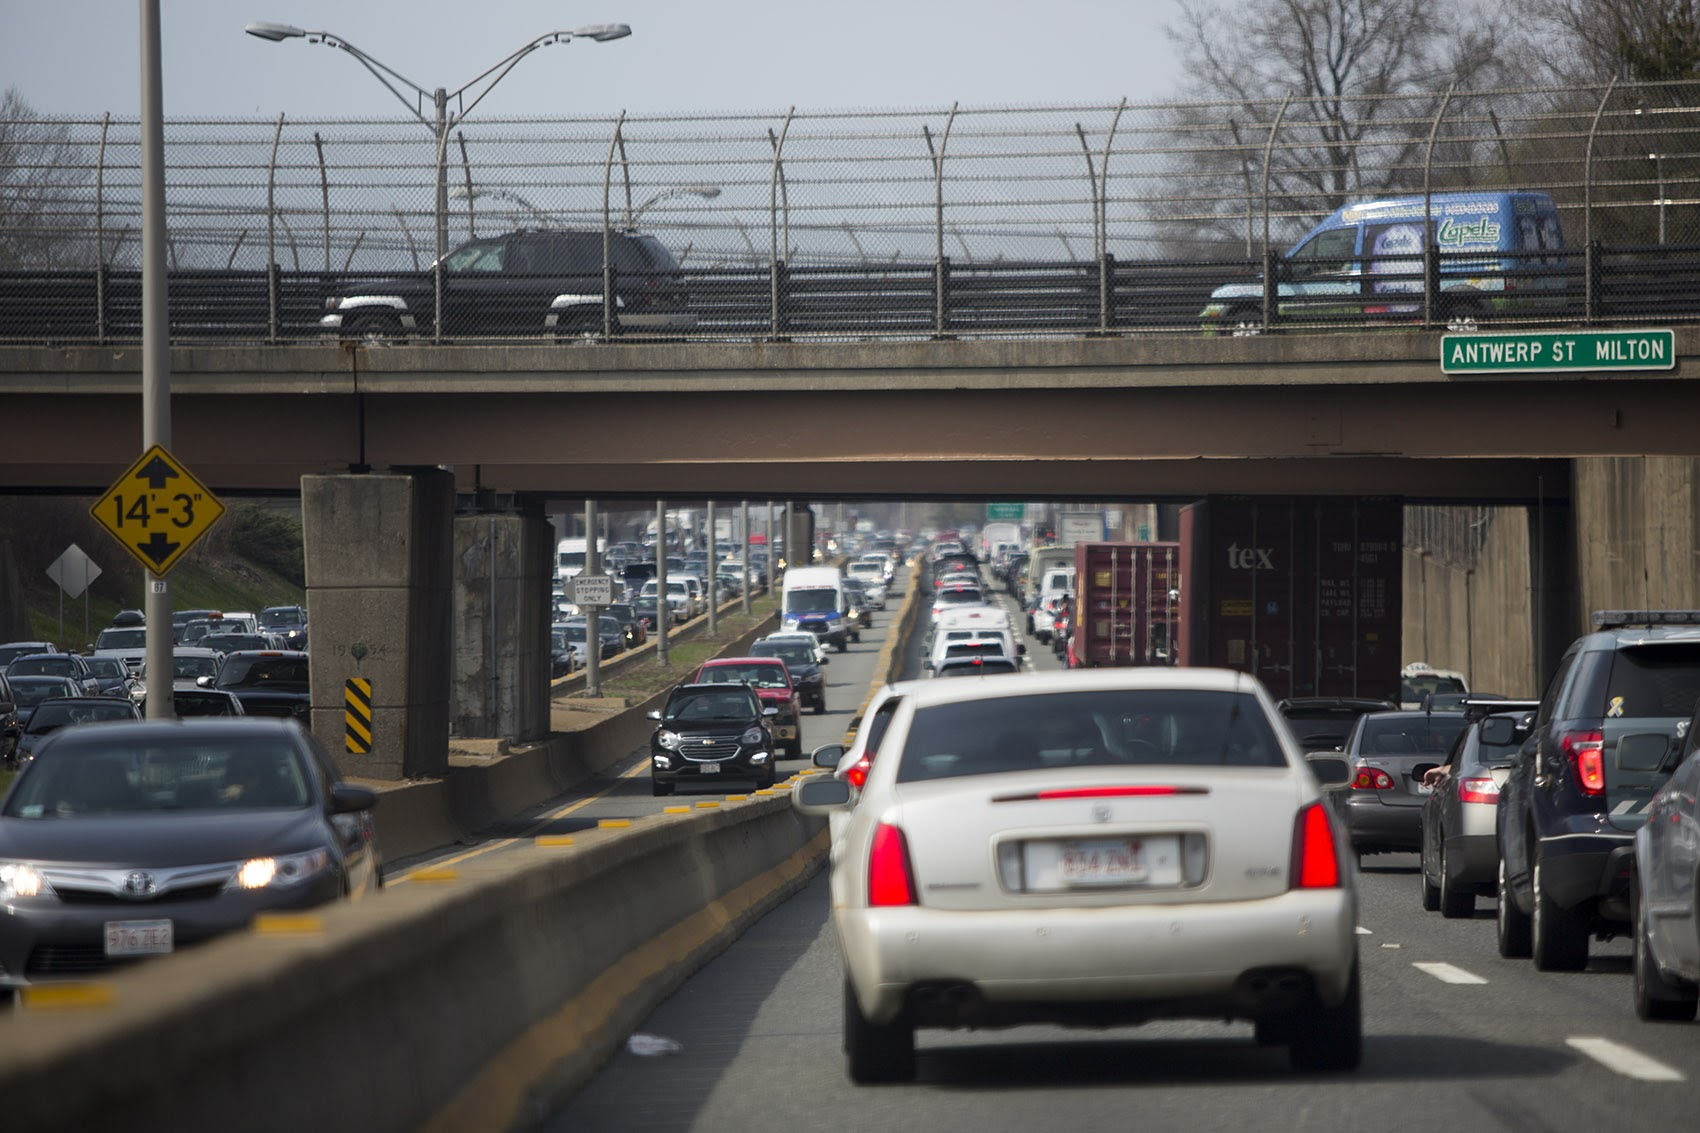 Gridlock on the Southeast Expressway in Milton. (Jesse Costa/WBUR)